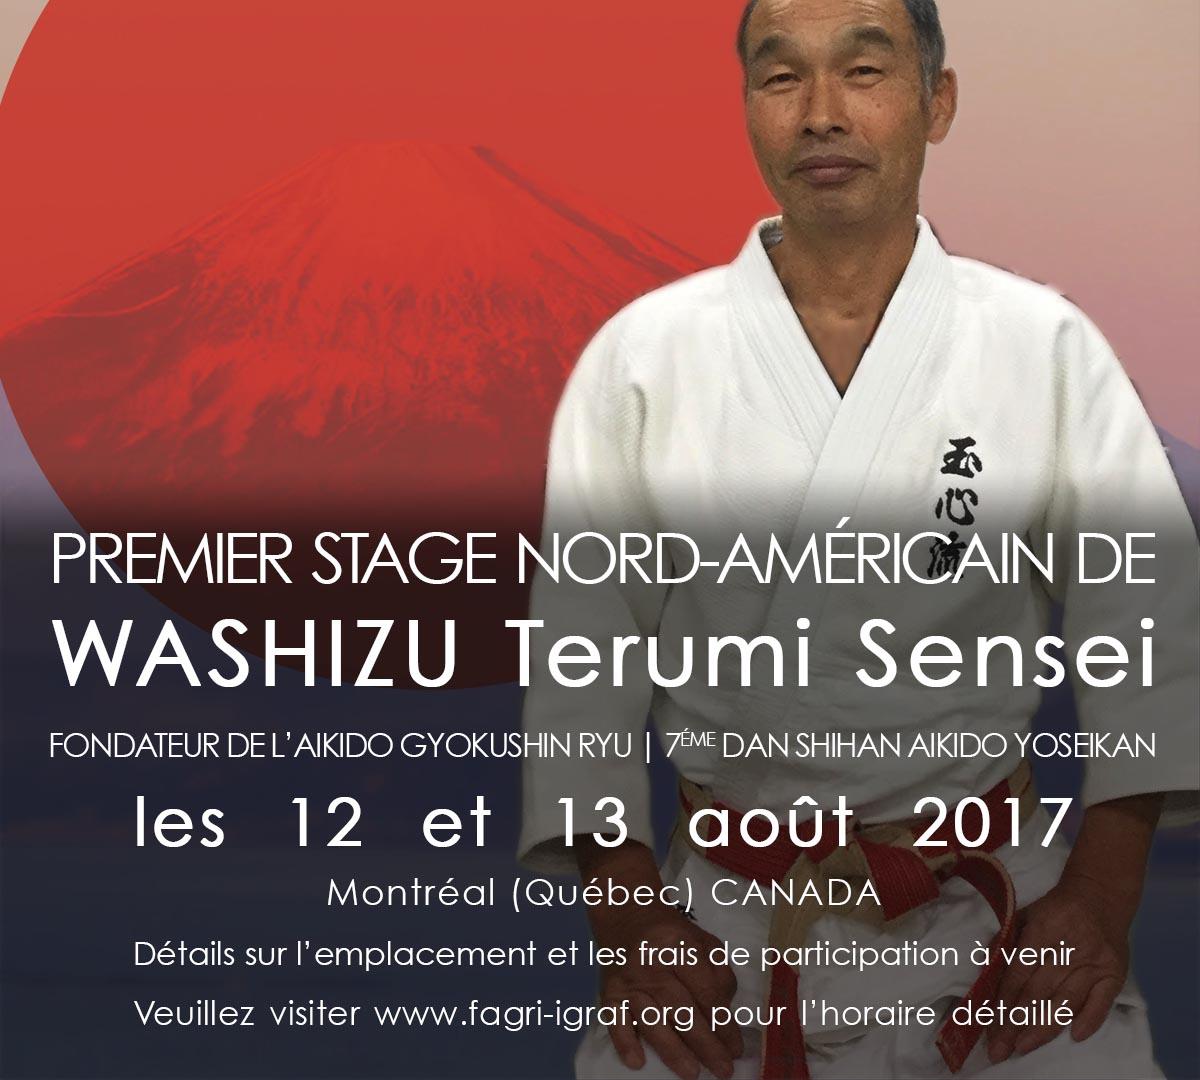 Gasshuku Montreal 2017